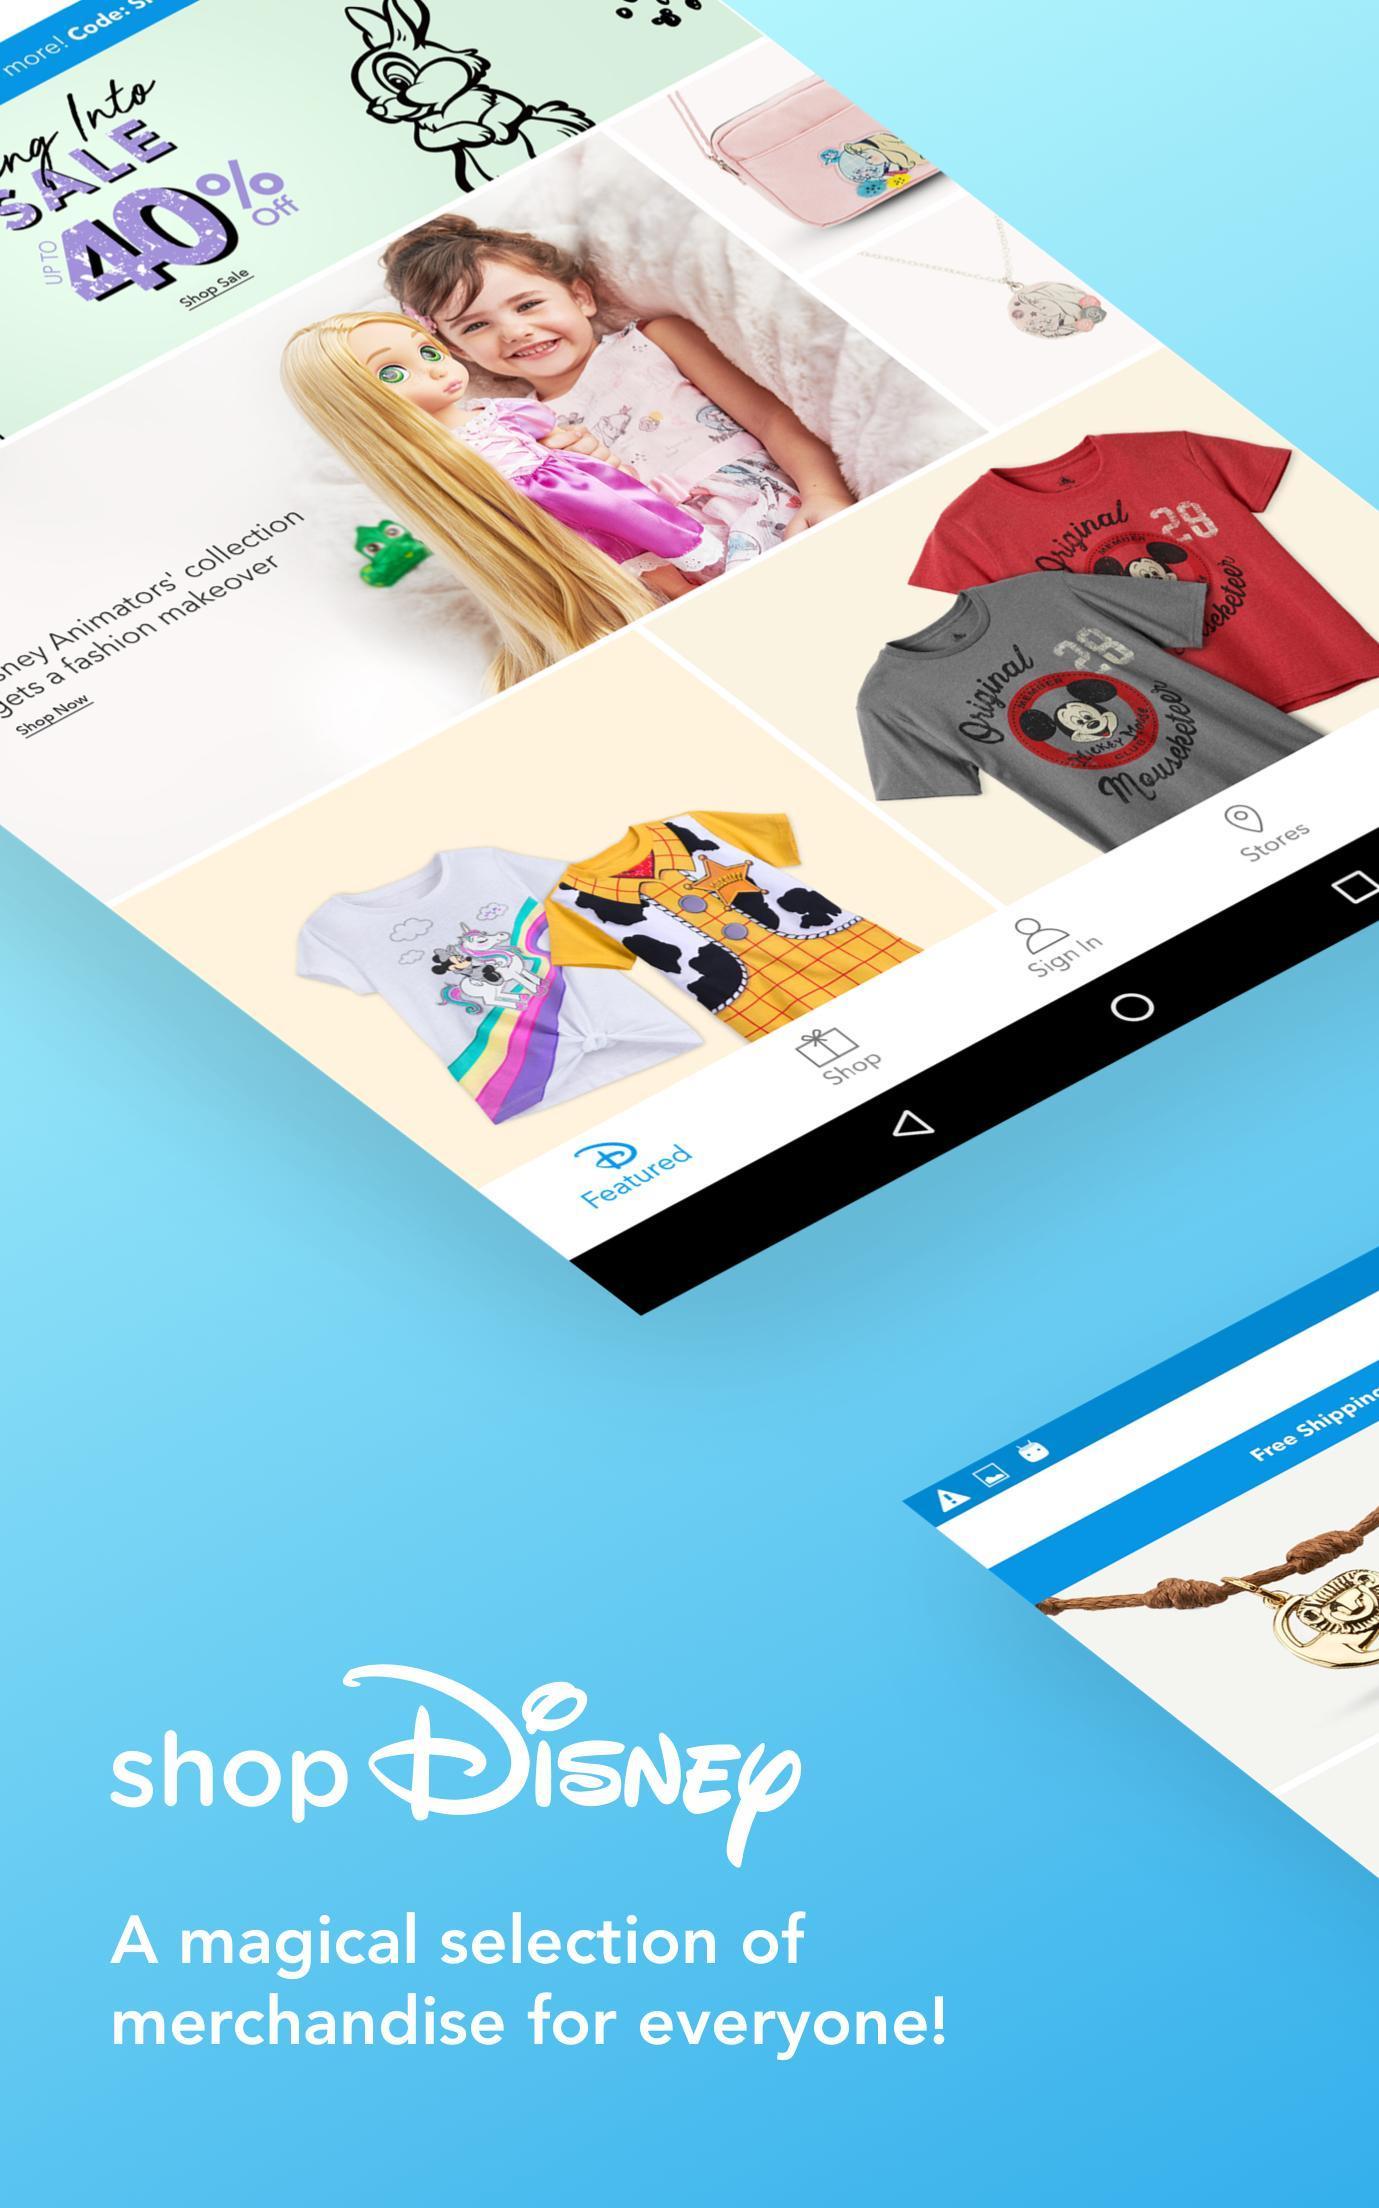 Shop Disney 3.1.1 Screenshot 11